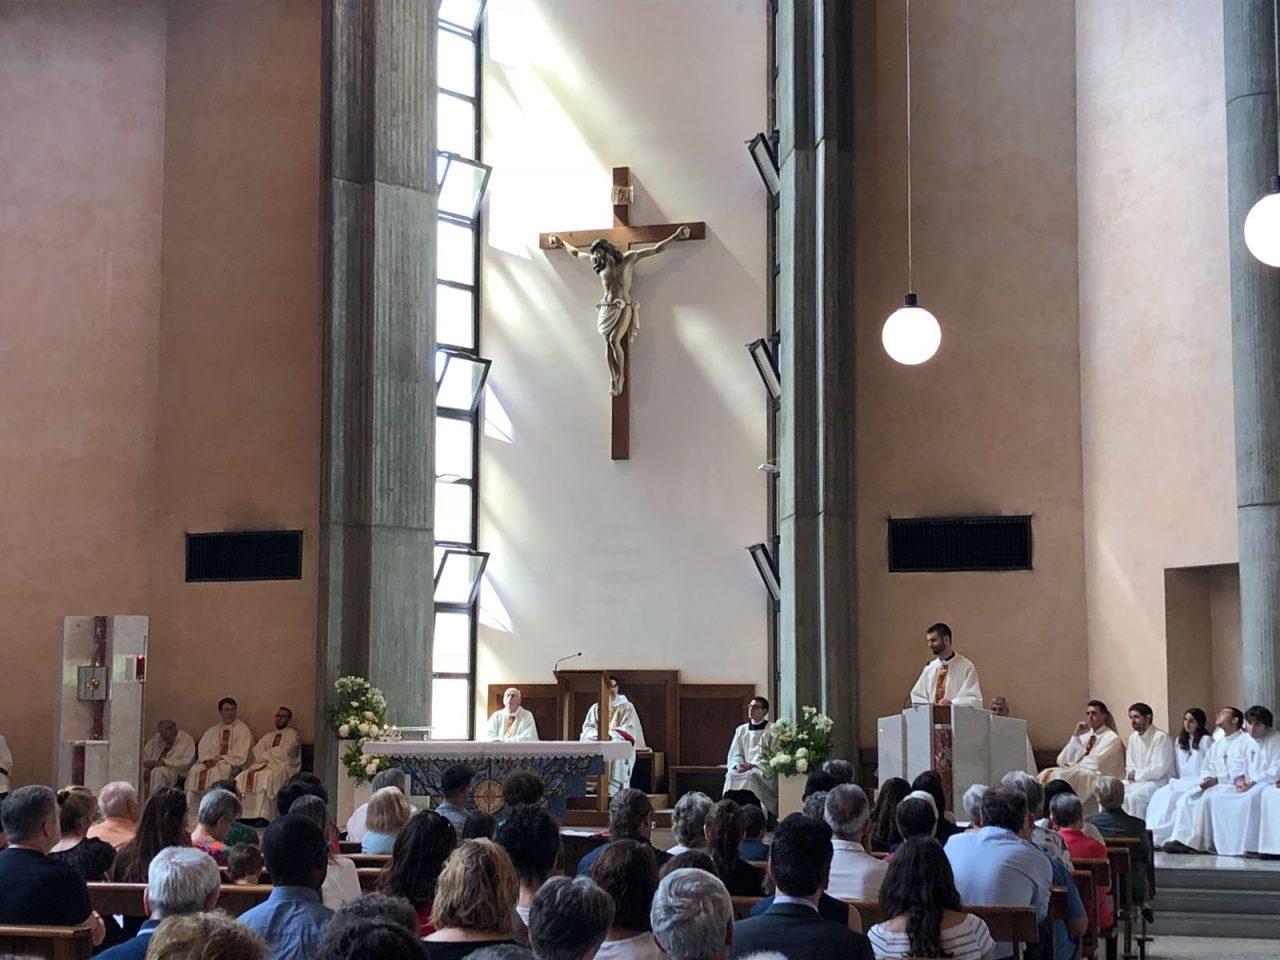 Novello sacerdote don Alberto Ravagnani prima messa a Brugherio